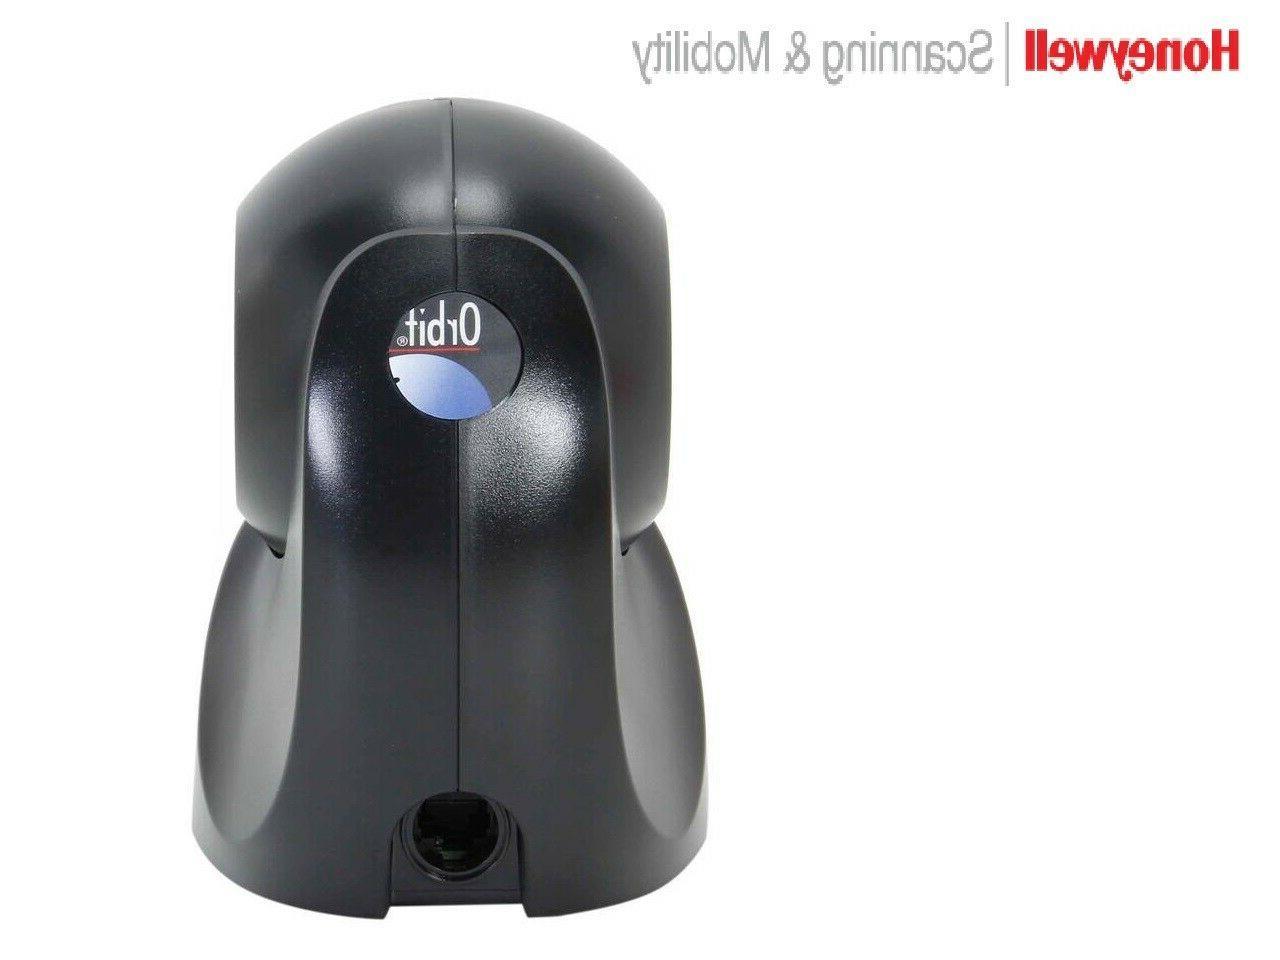 New Honeywell VeriFone Ruby - Fast